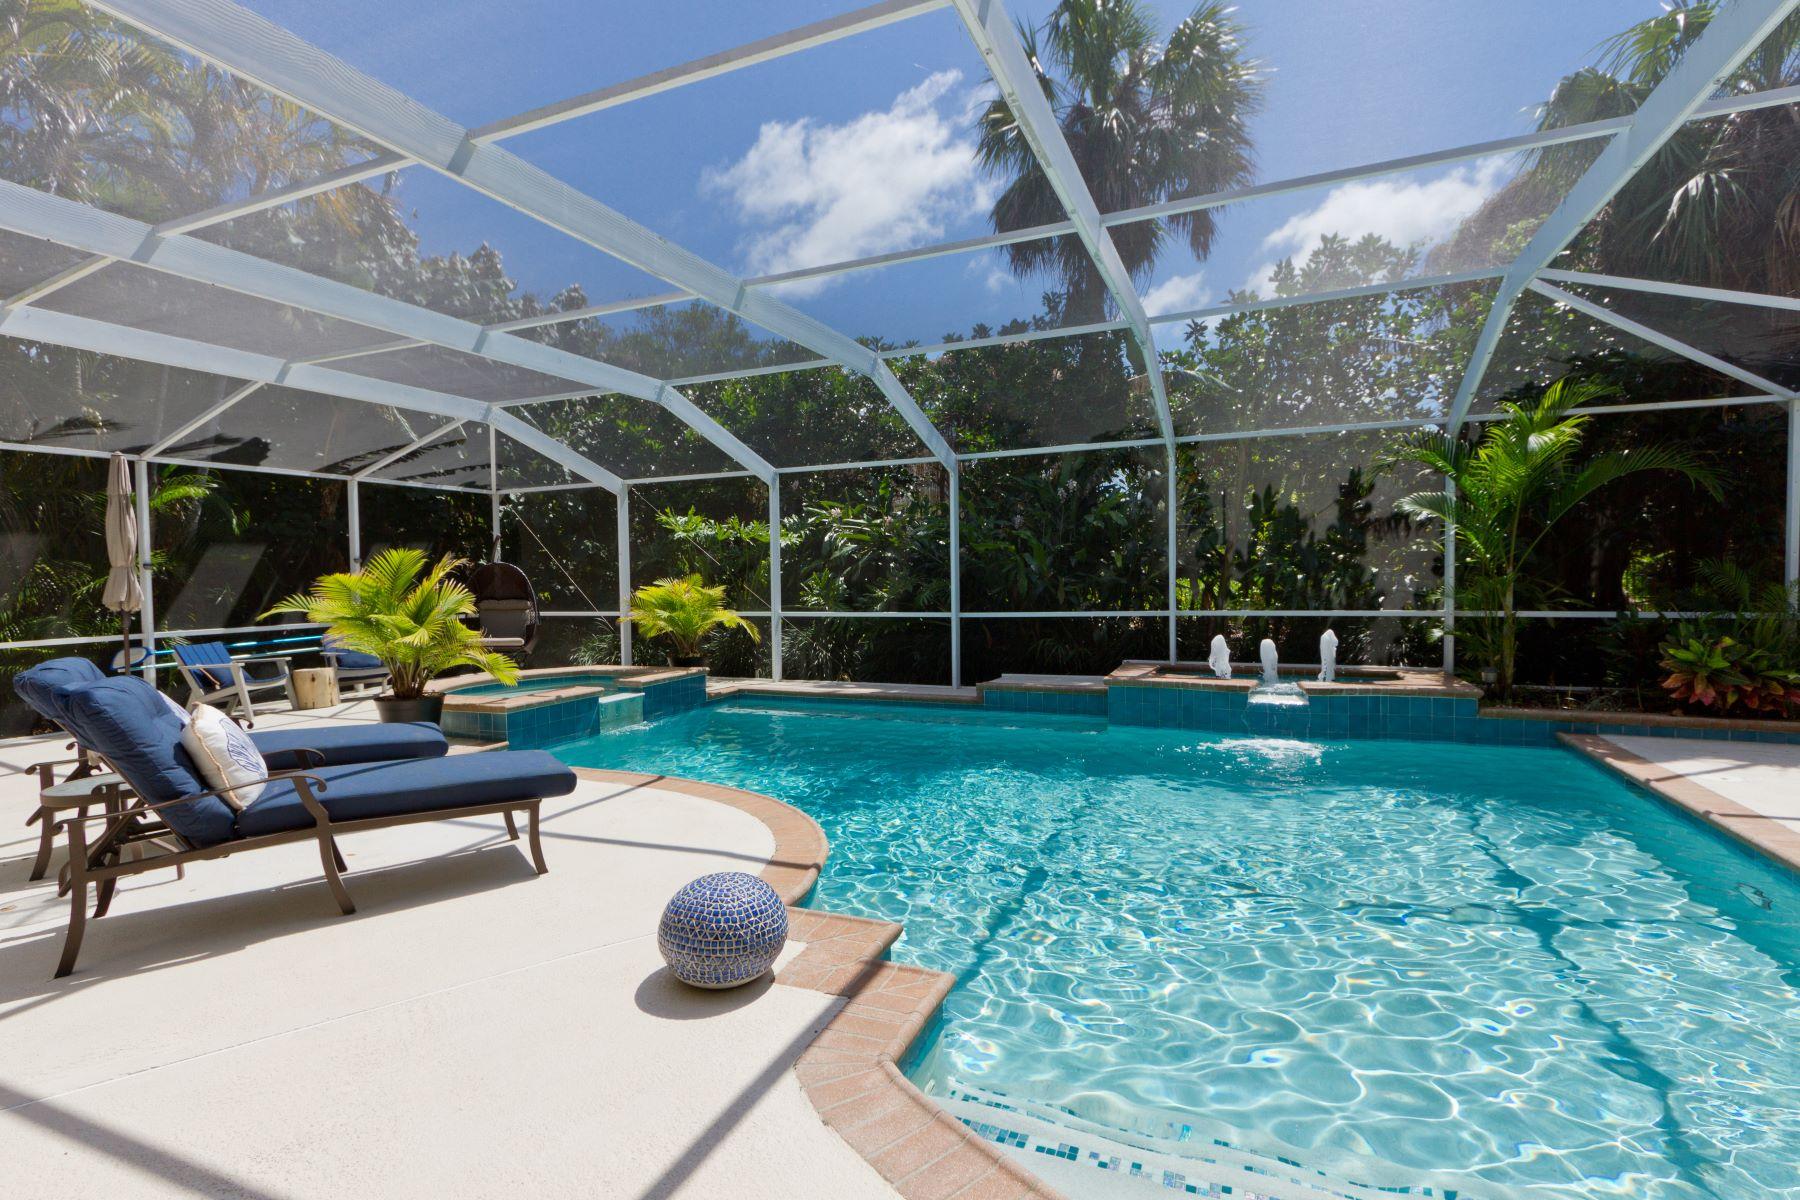 Single Family Homes for Sale at 221 Ocean Beach Trail Vero Beach, Florida 32963 United States